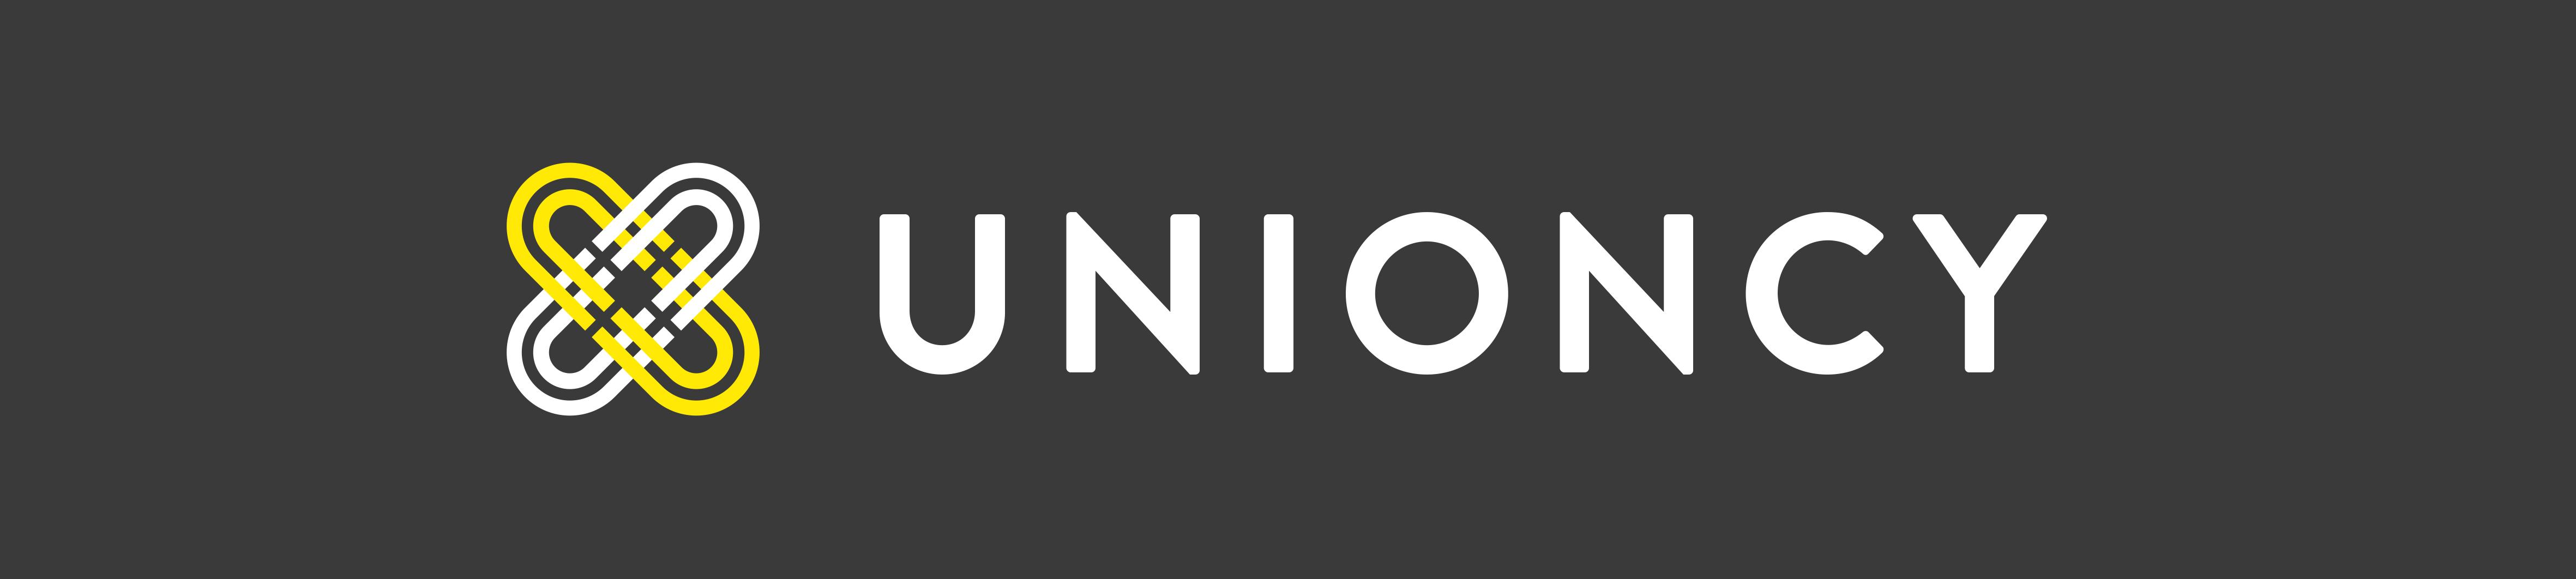 Unioncy_logo_big